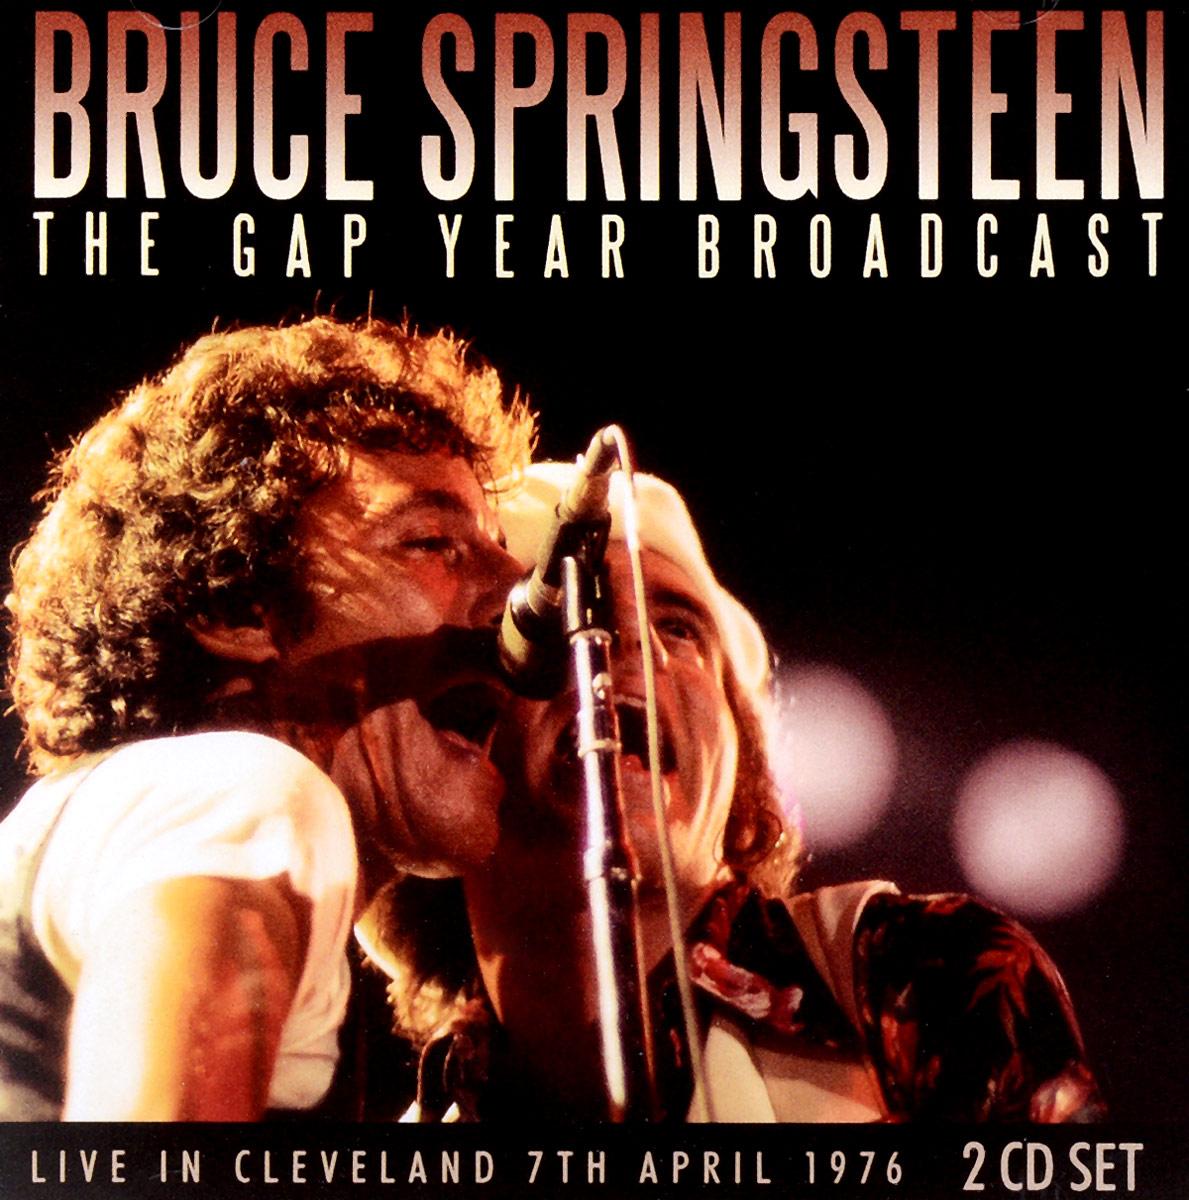 Брюс Спрингстин Bruce Springsteen. The Gap Year Broadcast (2 CD) брюс спрингстин bruce springsteen passaic night 1978 the classic new jersey broadcast volume two 2 lp